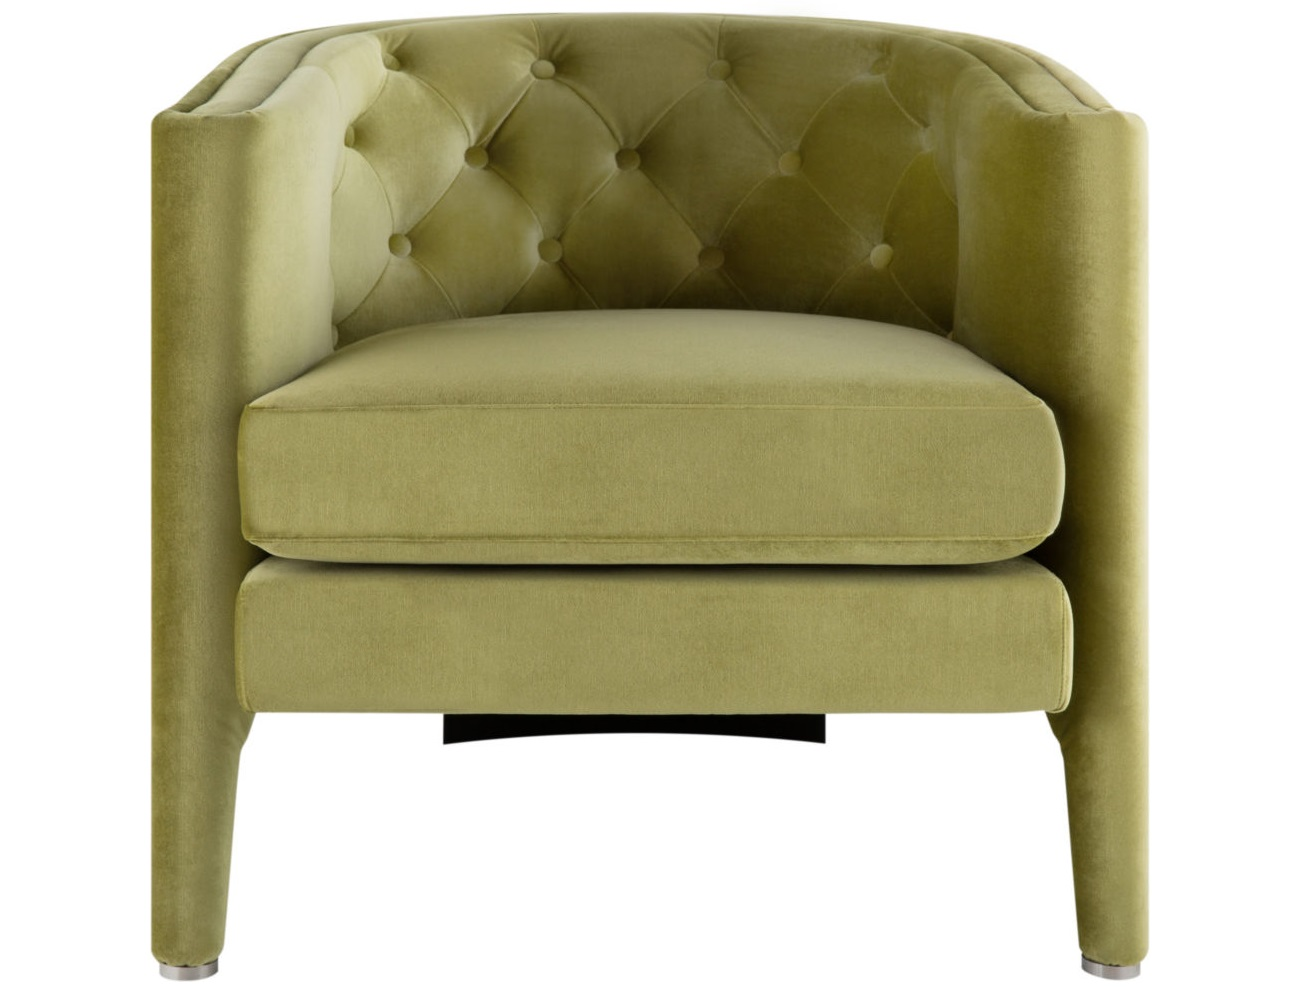 Кресло Ray greenИнтерьерные кресла<br><br><br>Material: Текстиль<br>Ширина см: 80<br>Высота см: 70<br>Глубина см: 75